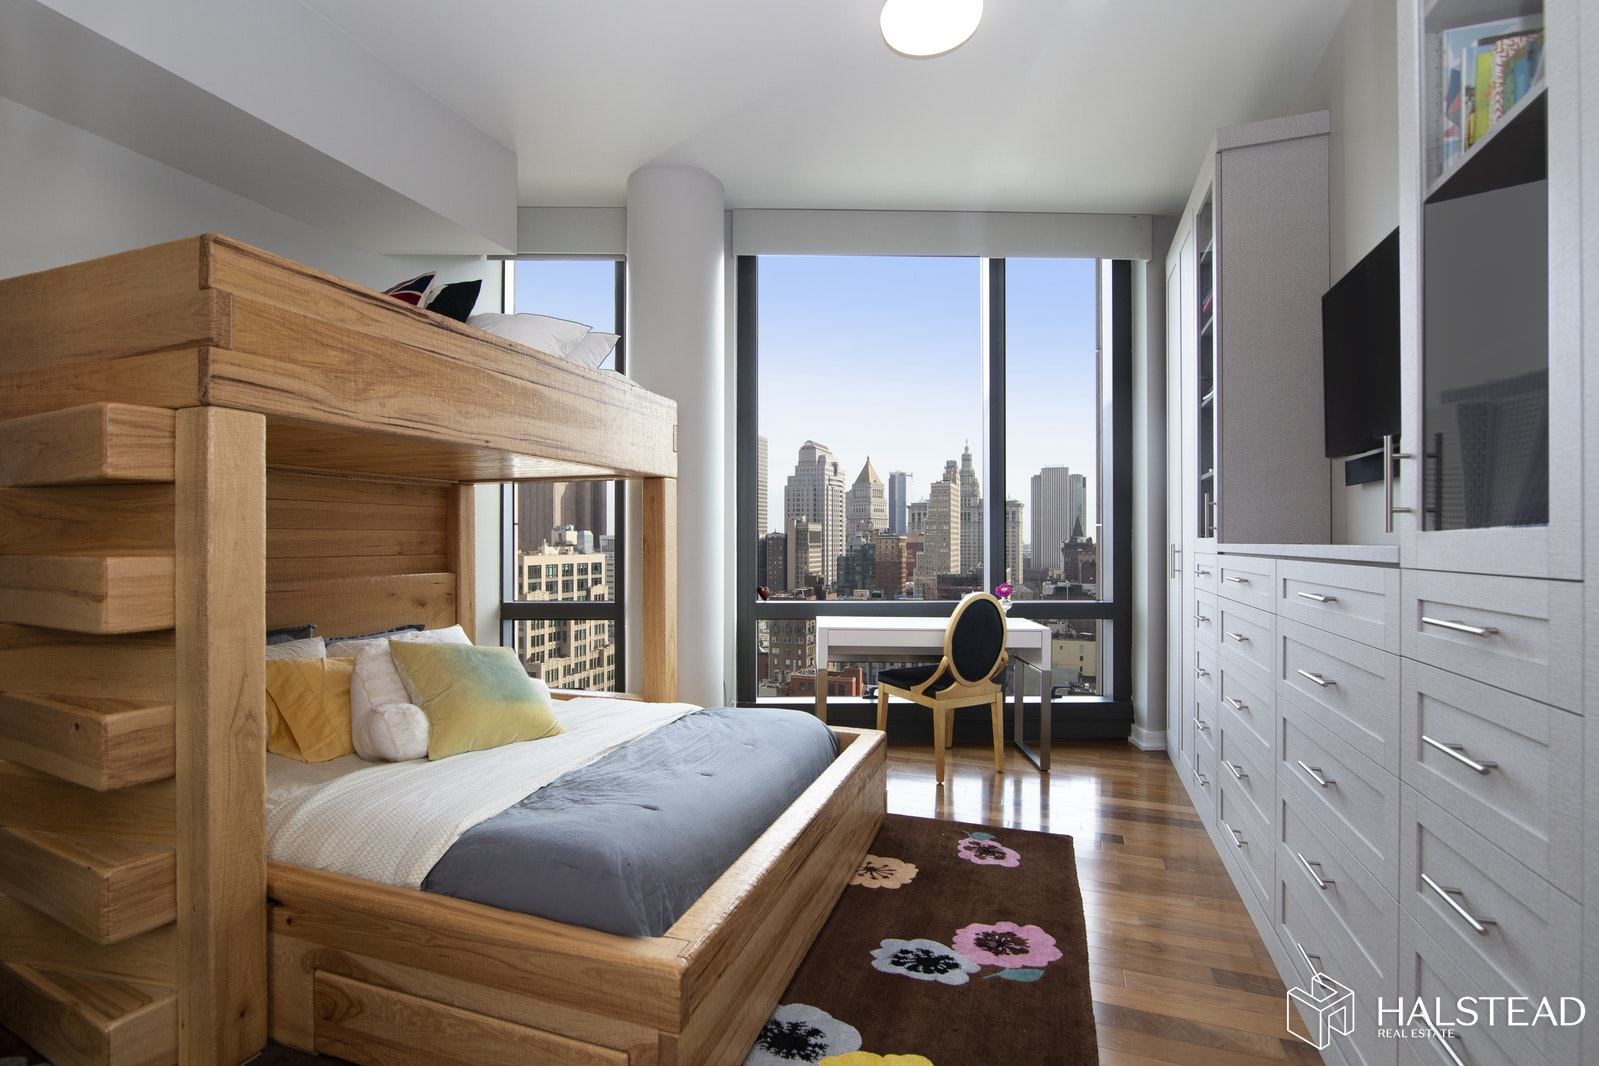 101 WARREN STREET 2350, Tribeca, $3,795,000, Web #: 19500299